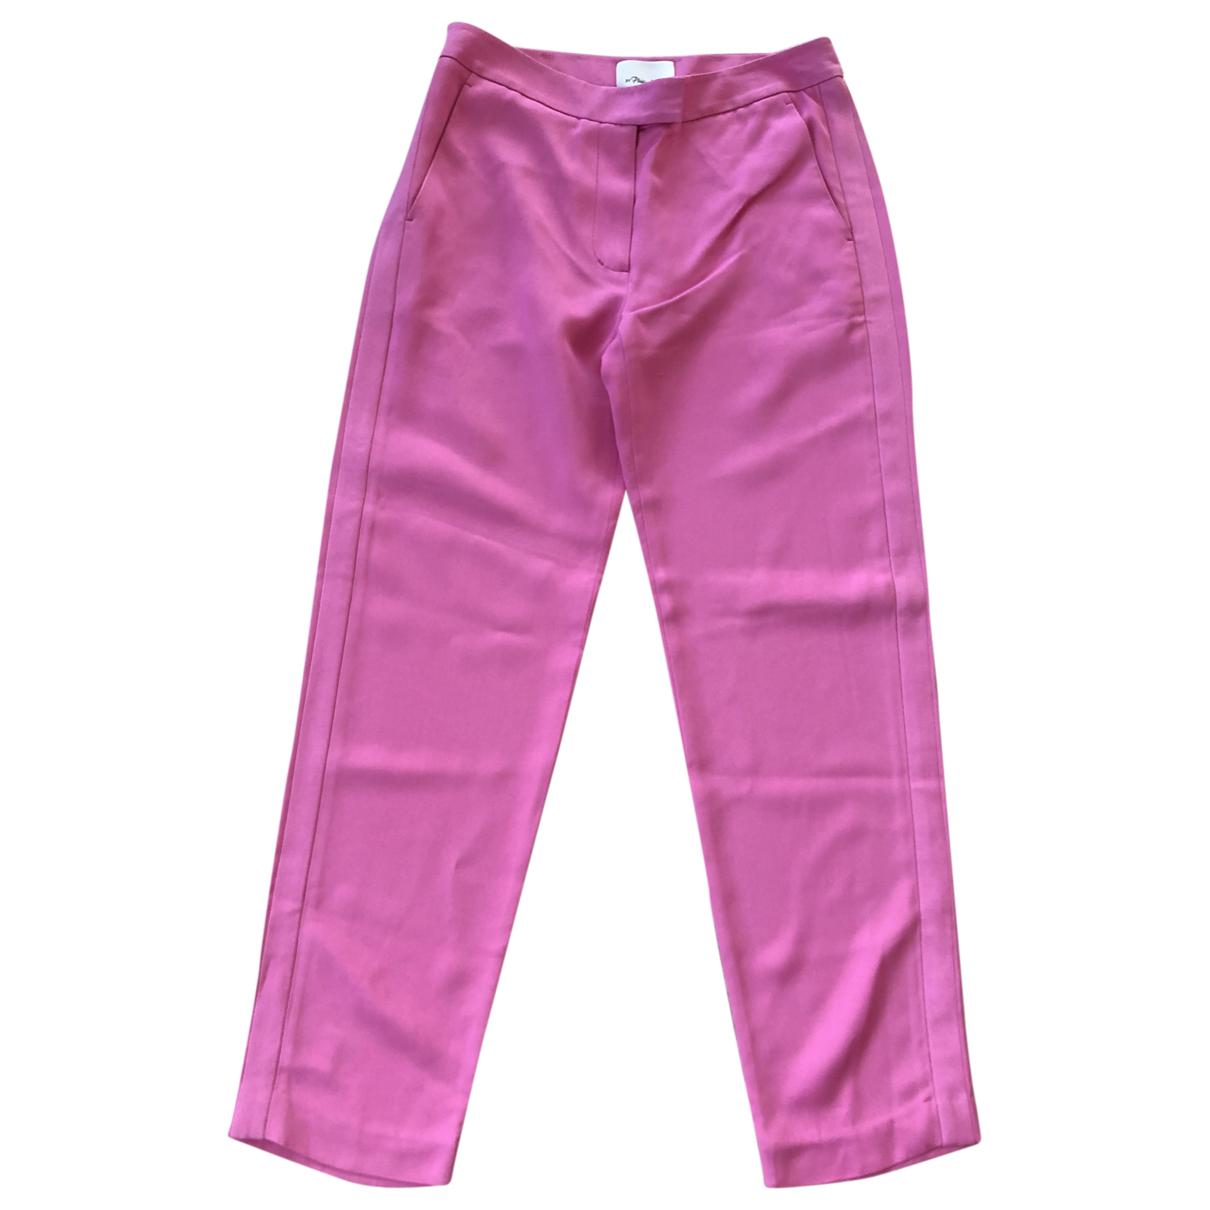 Pantalon en Viscosa Rosa 3.1 Phillip Lim